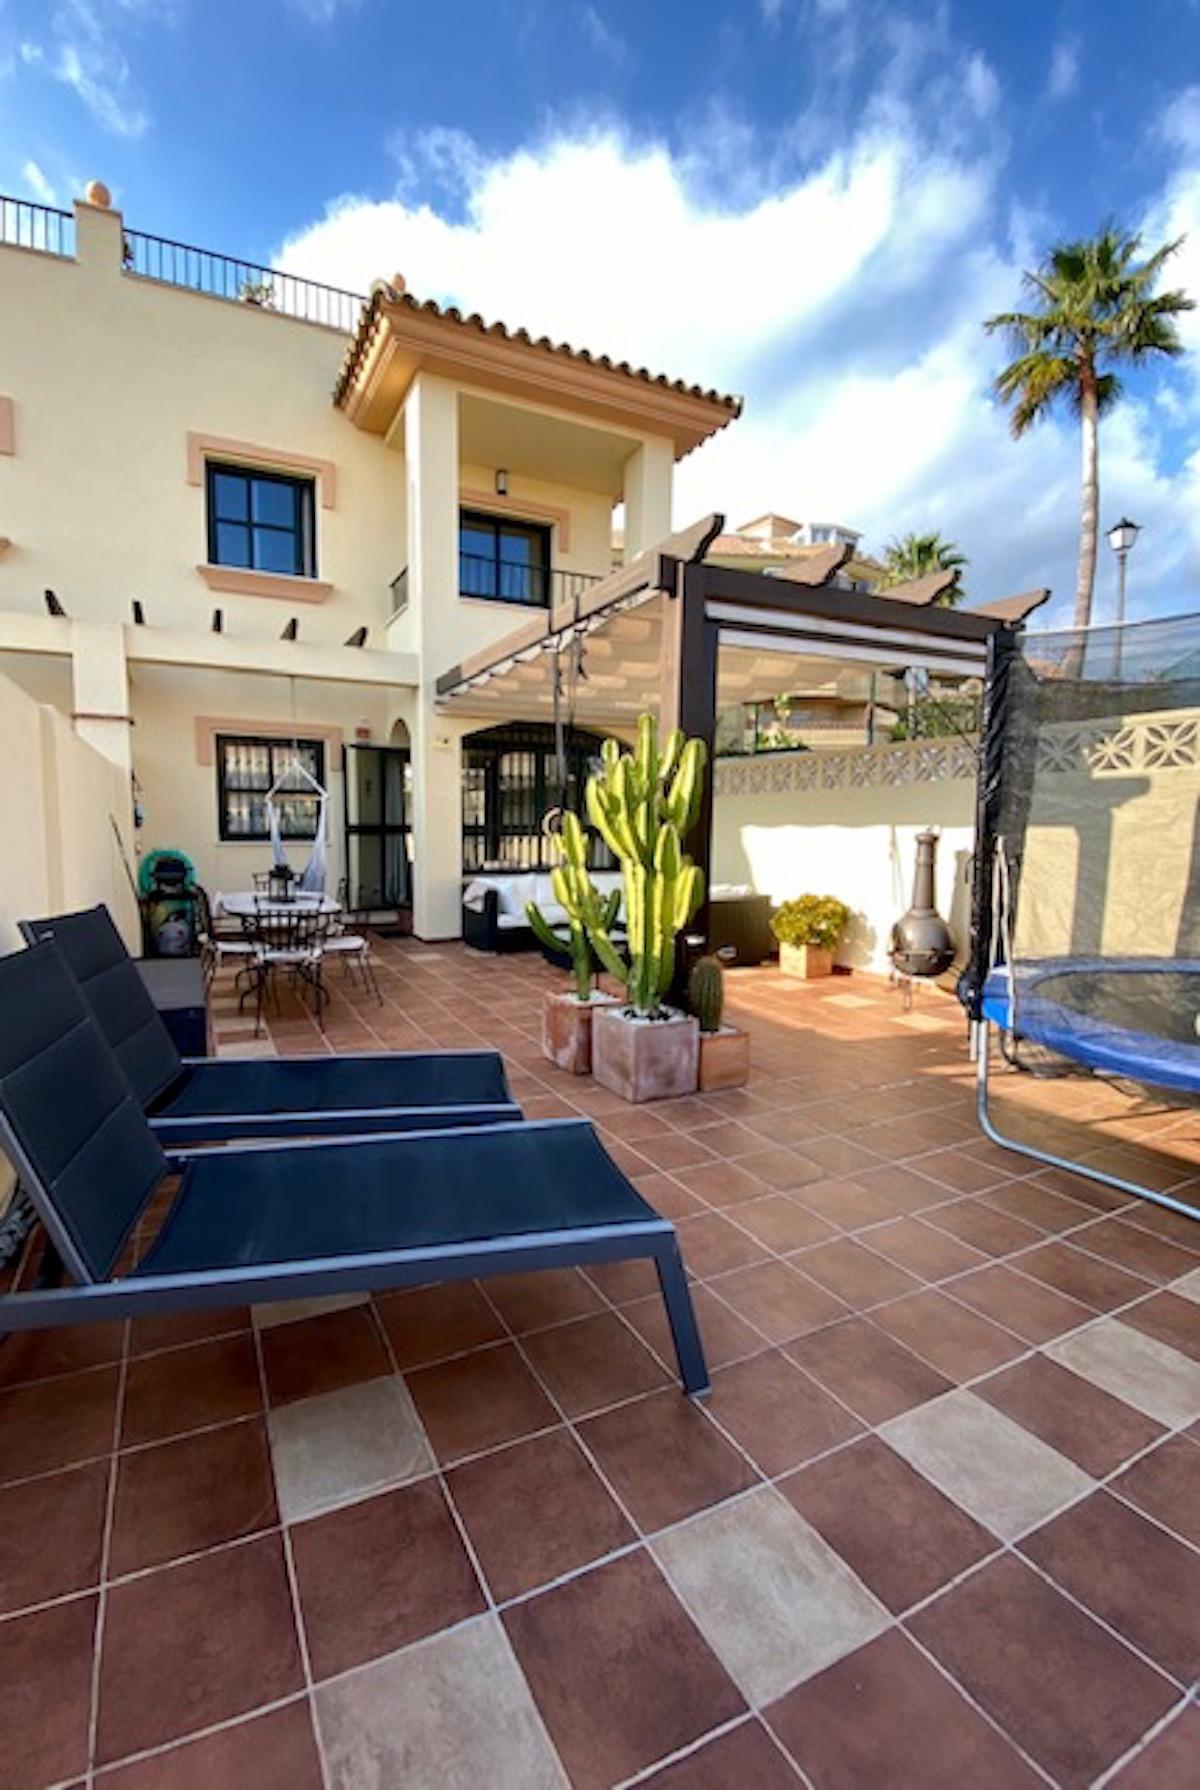 Townhouse, Los Pacos, Costa del Sol. 3 Bedrooms, 3 Bathrooms, Built 137 m², Terrace 98 m². 4 parking,Spain